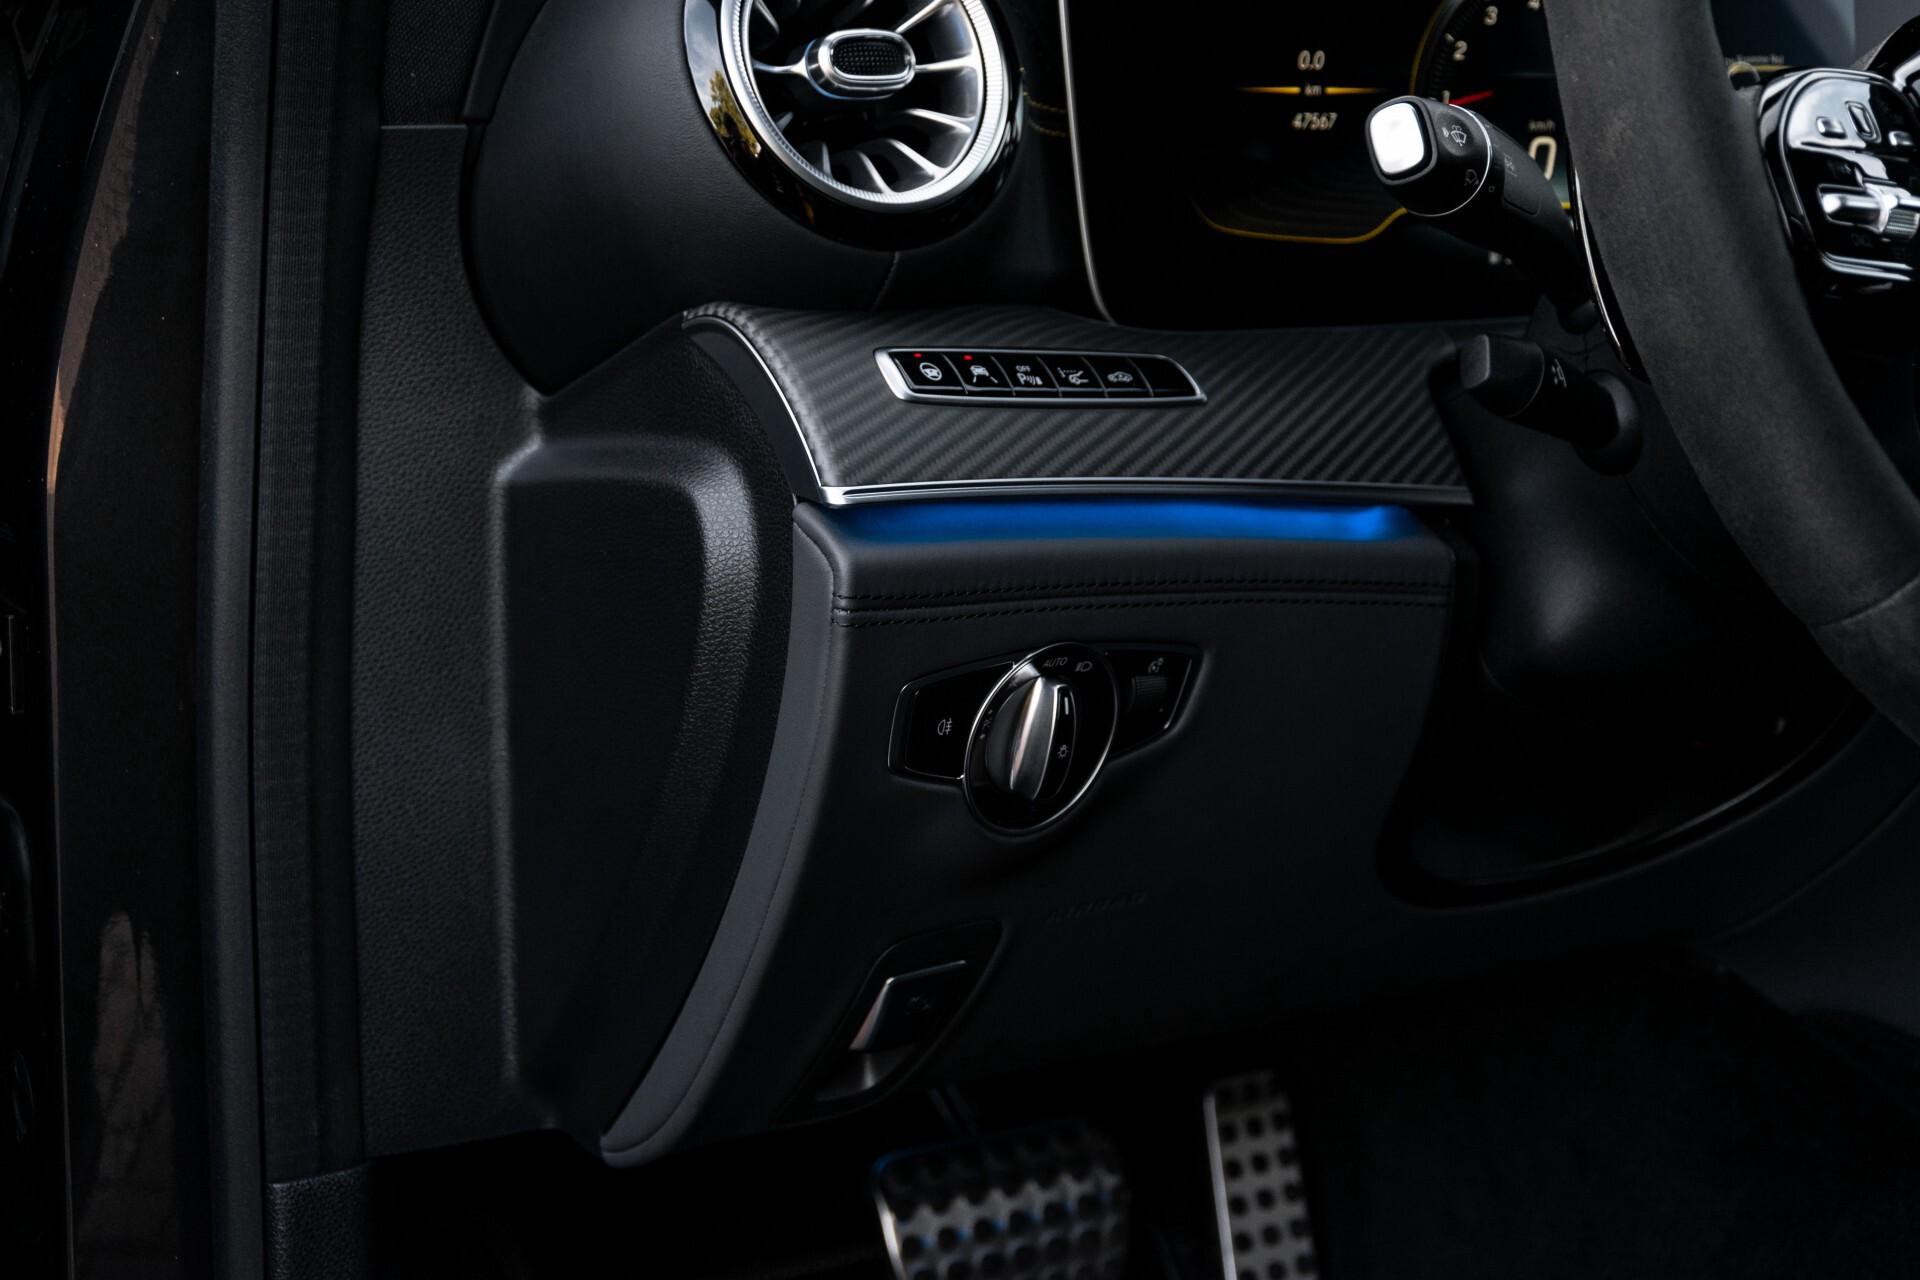 Mercedes-Benz AMG GT 4-Door Coupe 63 S 4MATIC+ Edition 1 Keramisch/Carbon/First Class/Dynamic Plus/Burmester High End 3D Aut9 Foto 32